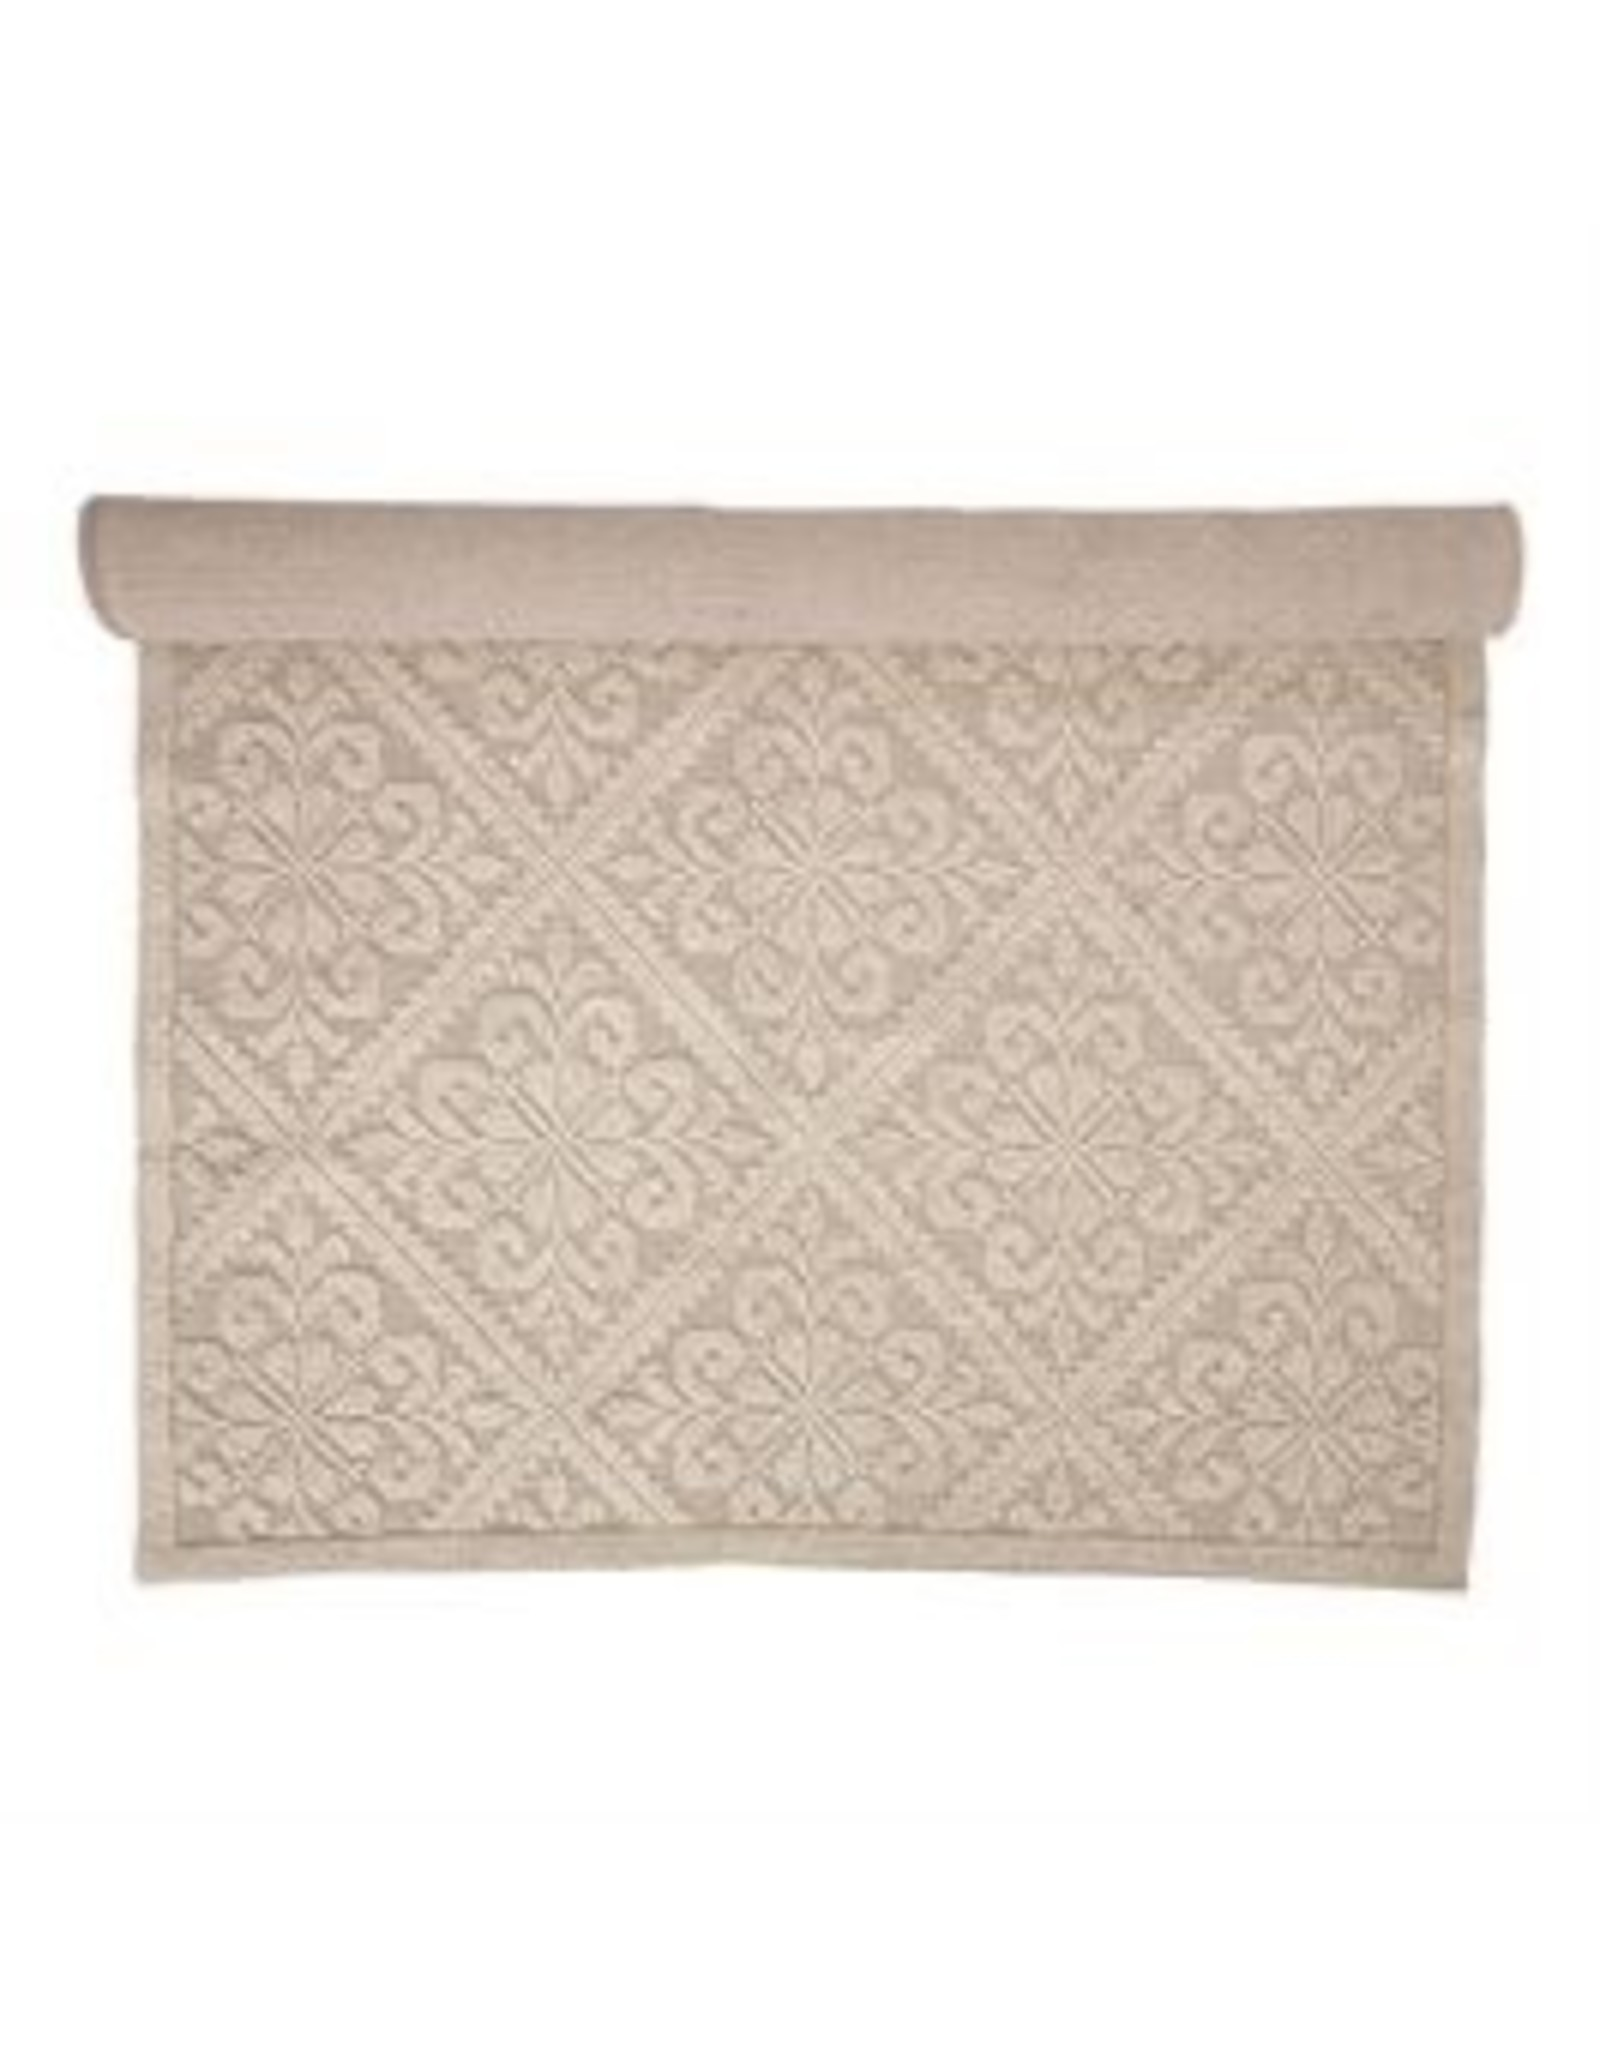 Bloomingville 5' x 7' Cotton/Wool Blend Rug